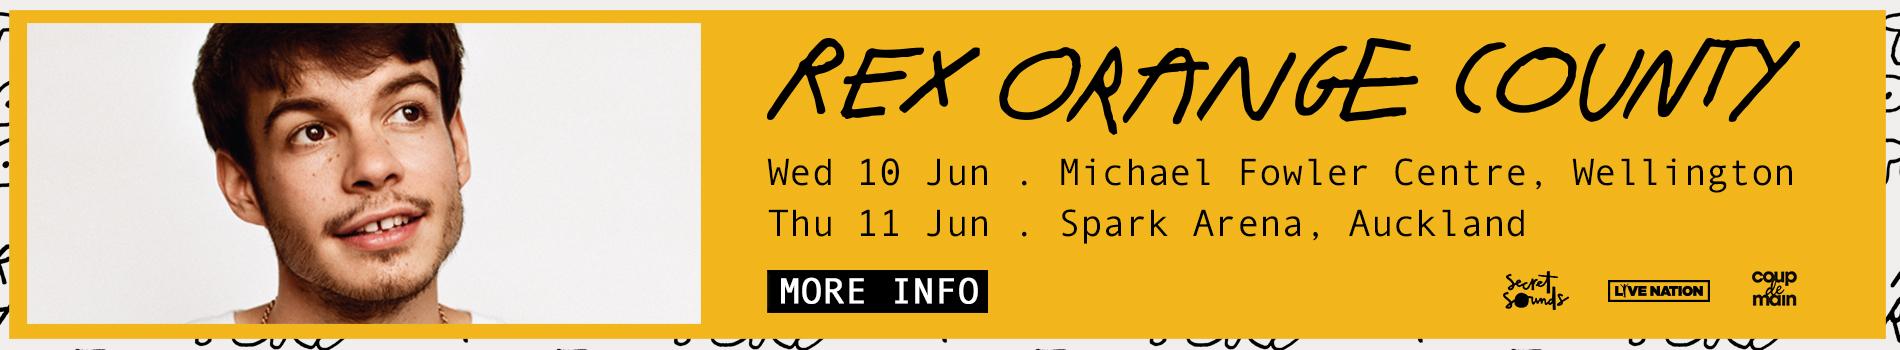 Rex Orange County Tour - Masthead Banner